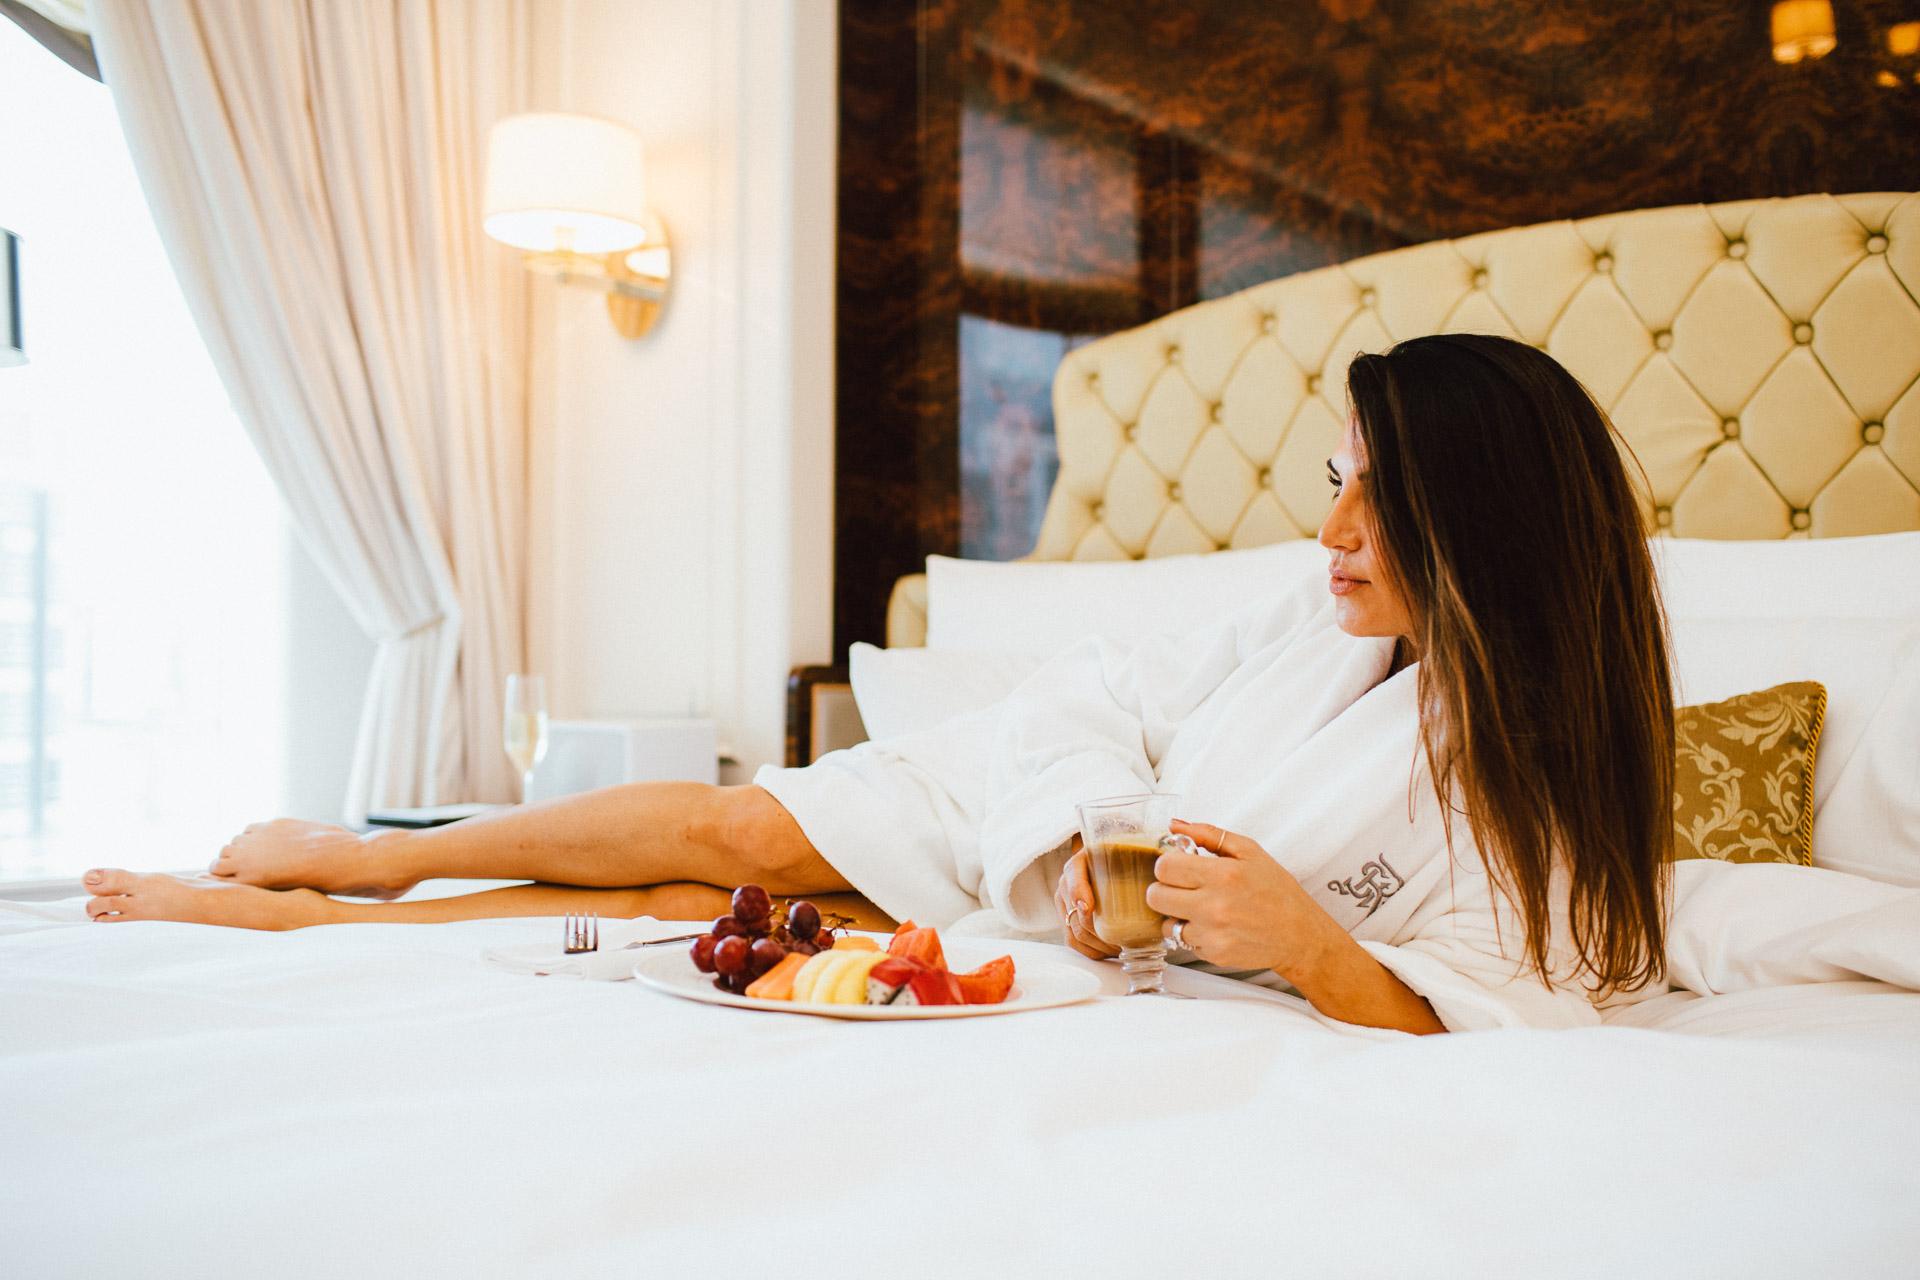 st-regis-singapore-marriott-luxury-hotel-photographer-12.jpg